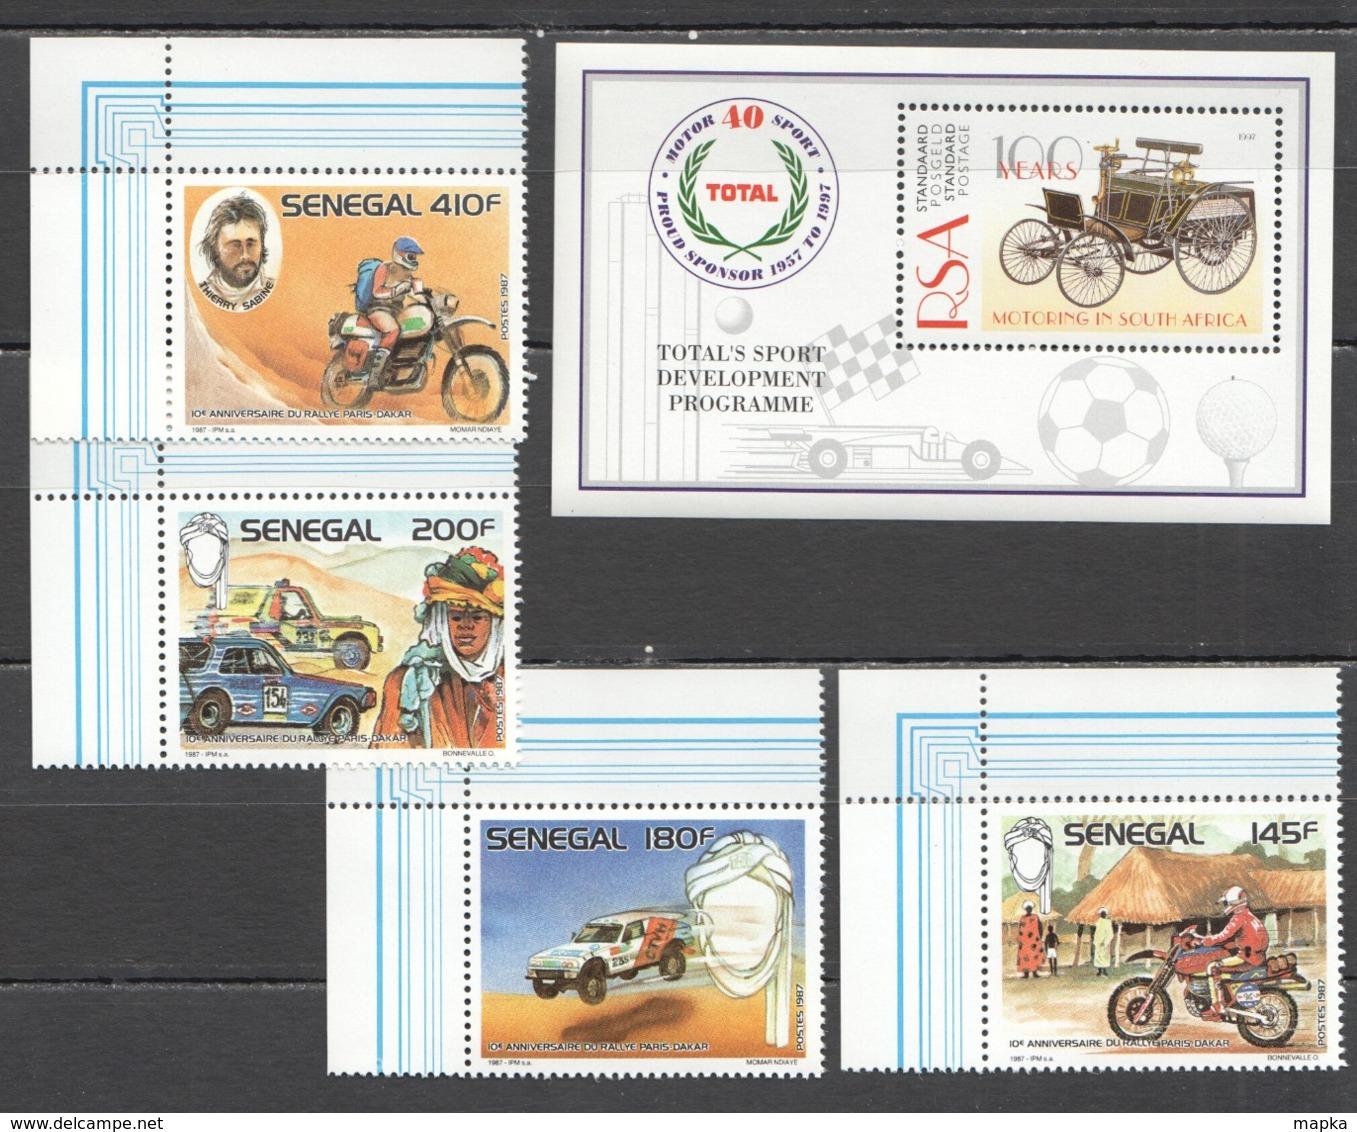 B689 1987,1997 RSA SENEGAL TRANSPORTATION TRAINS CARS MOTORING SOUTH AFRICA RALLY PARIS-DAKAR 1SET+1BL MNH - Cars